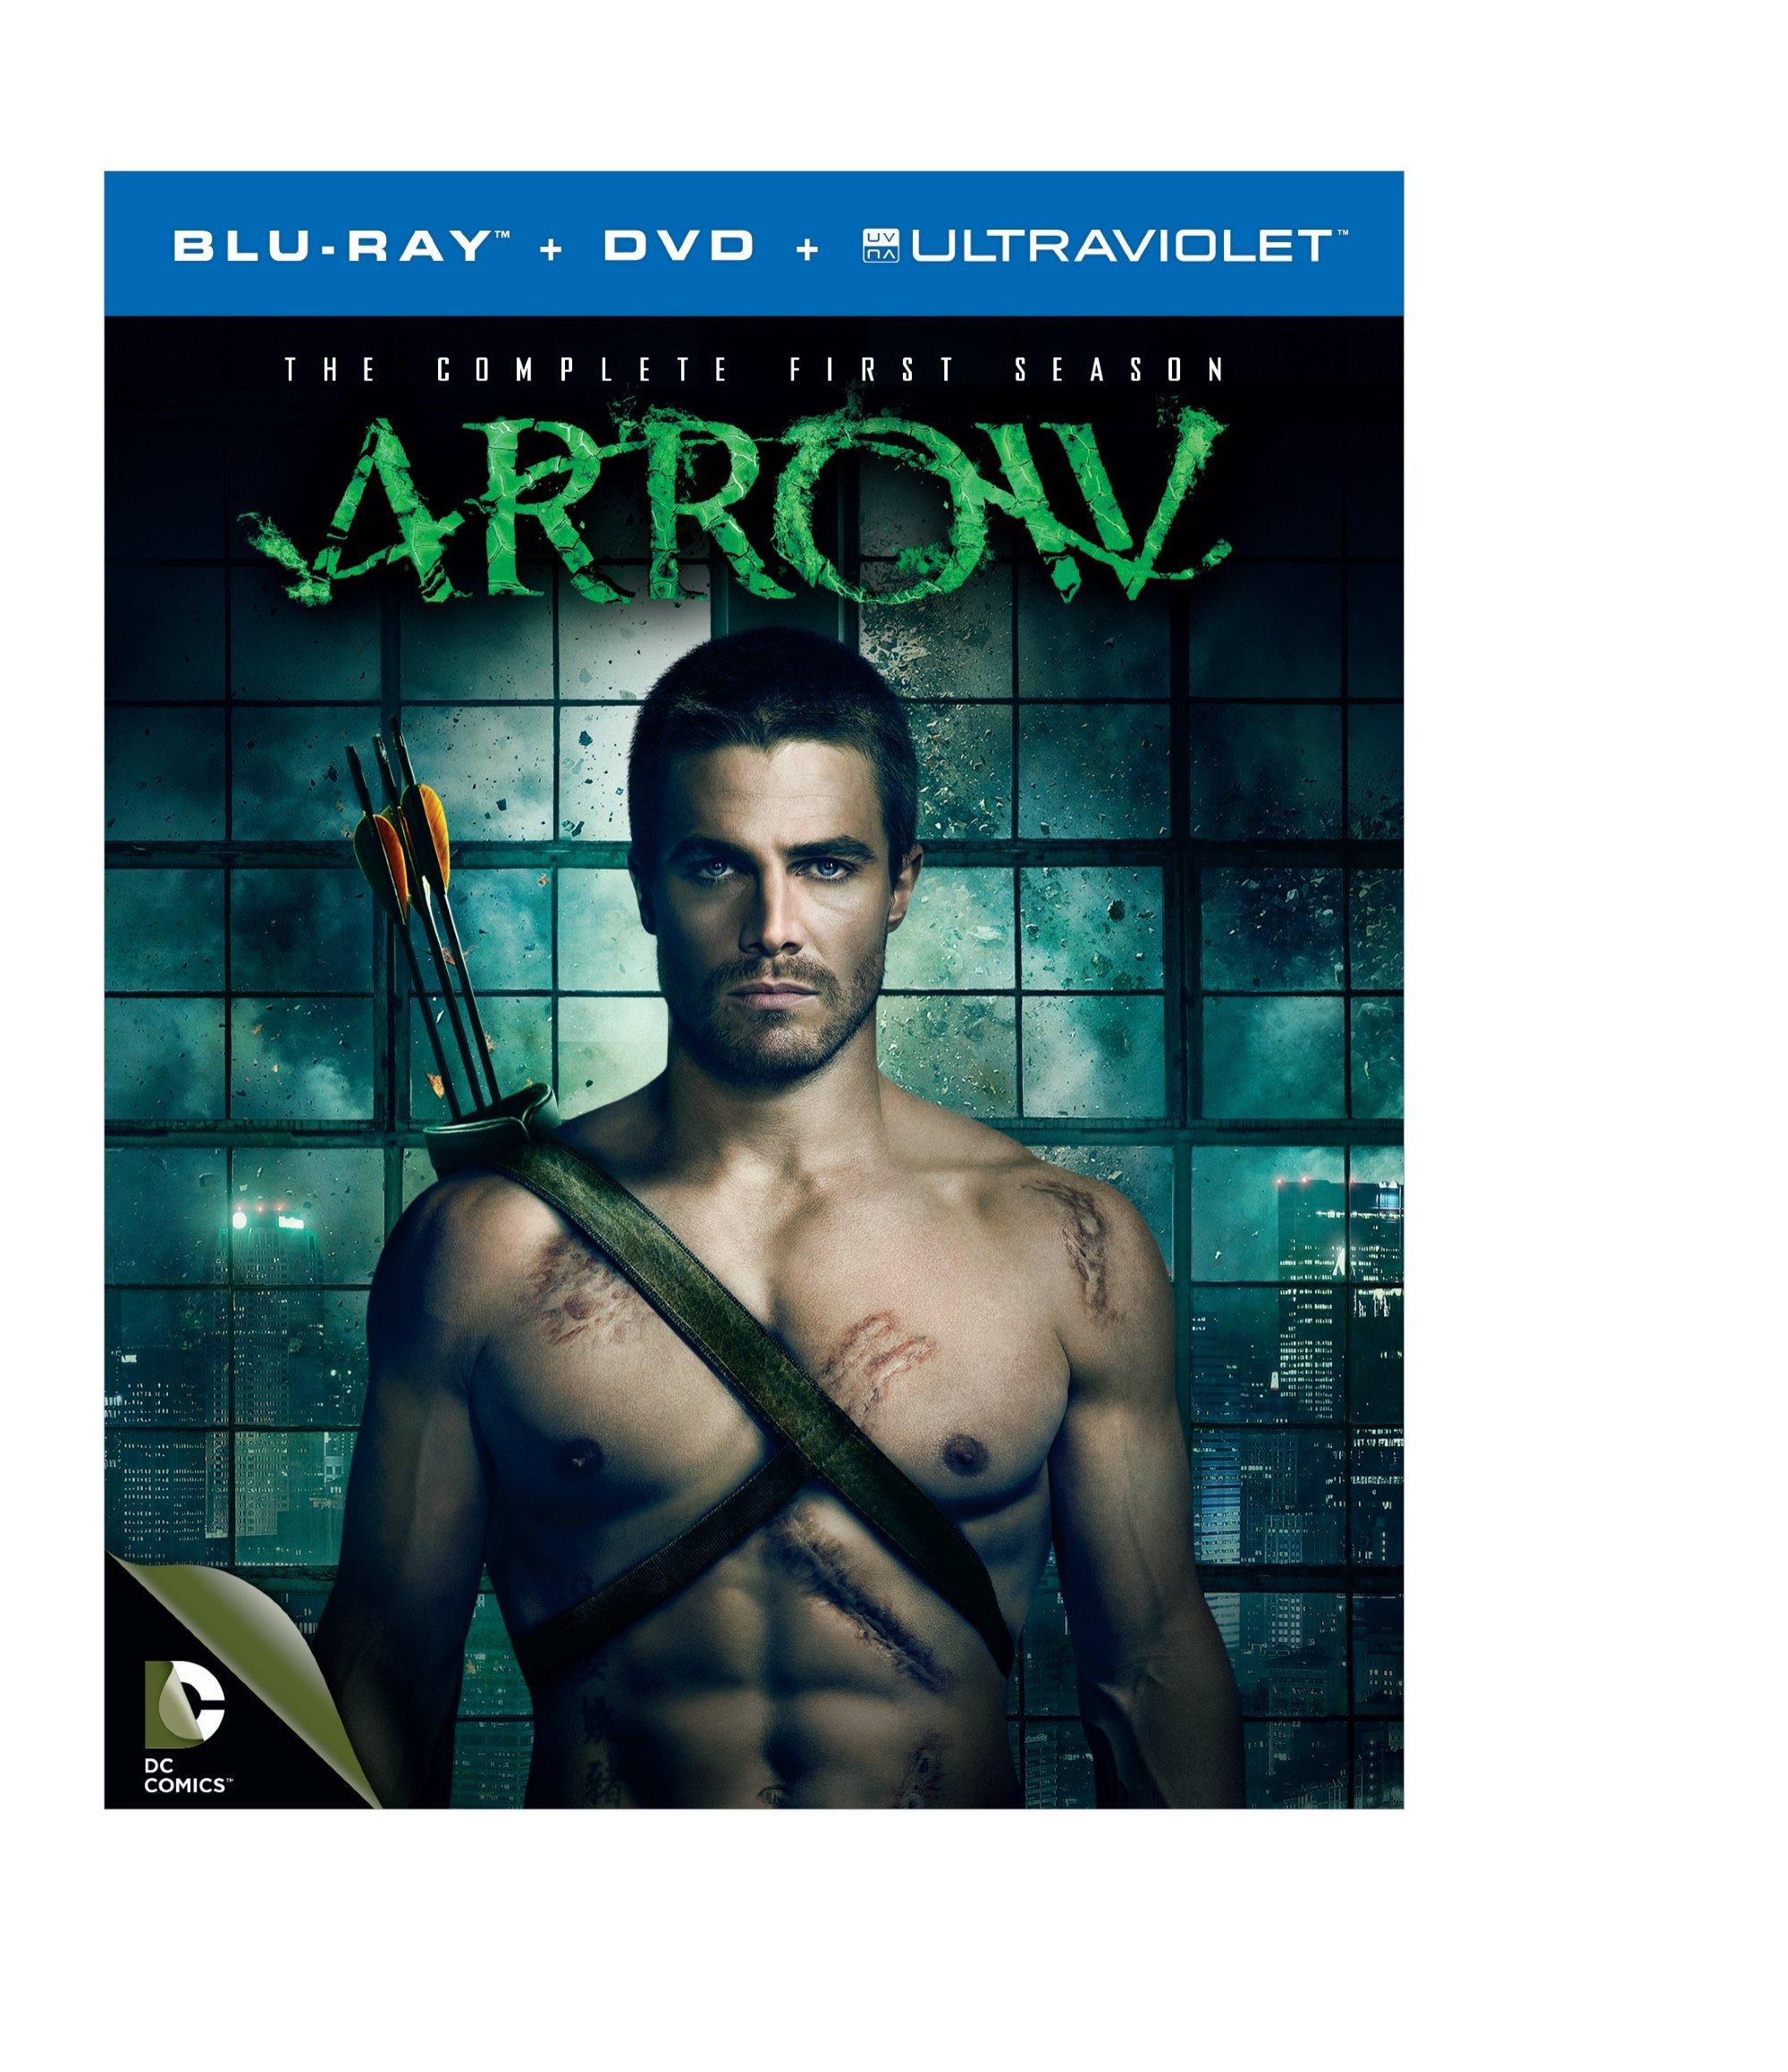 Arrow: Season 1 (Blu-ray + DVD + UltraViolet) by WARNER HOME VIDEO